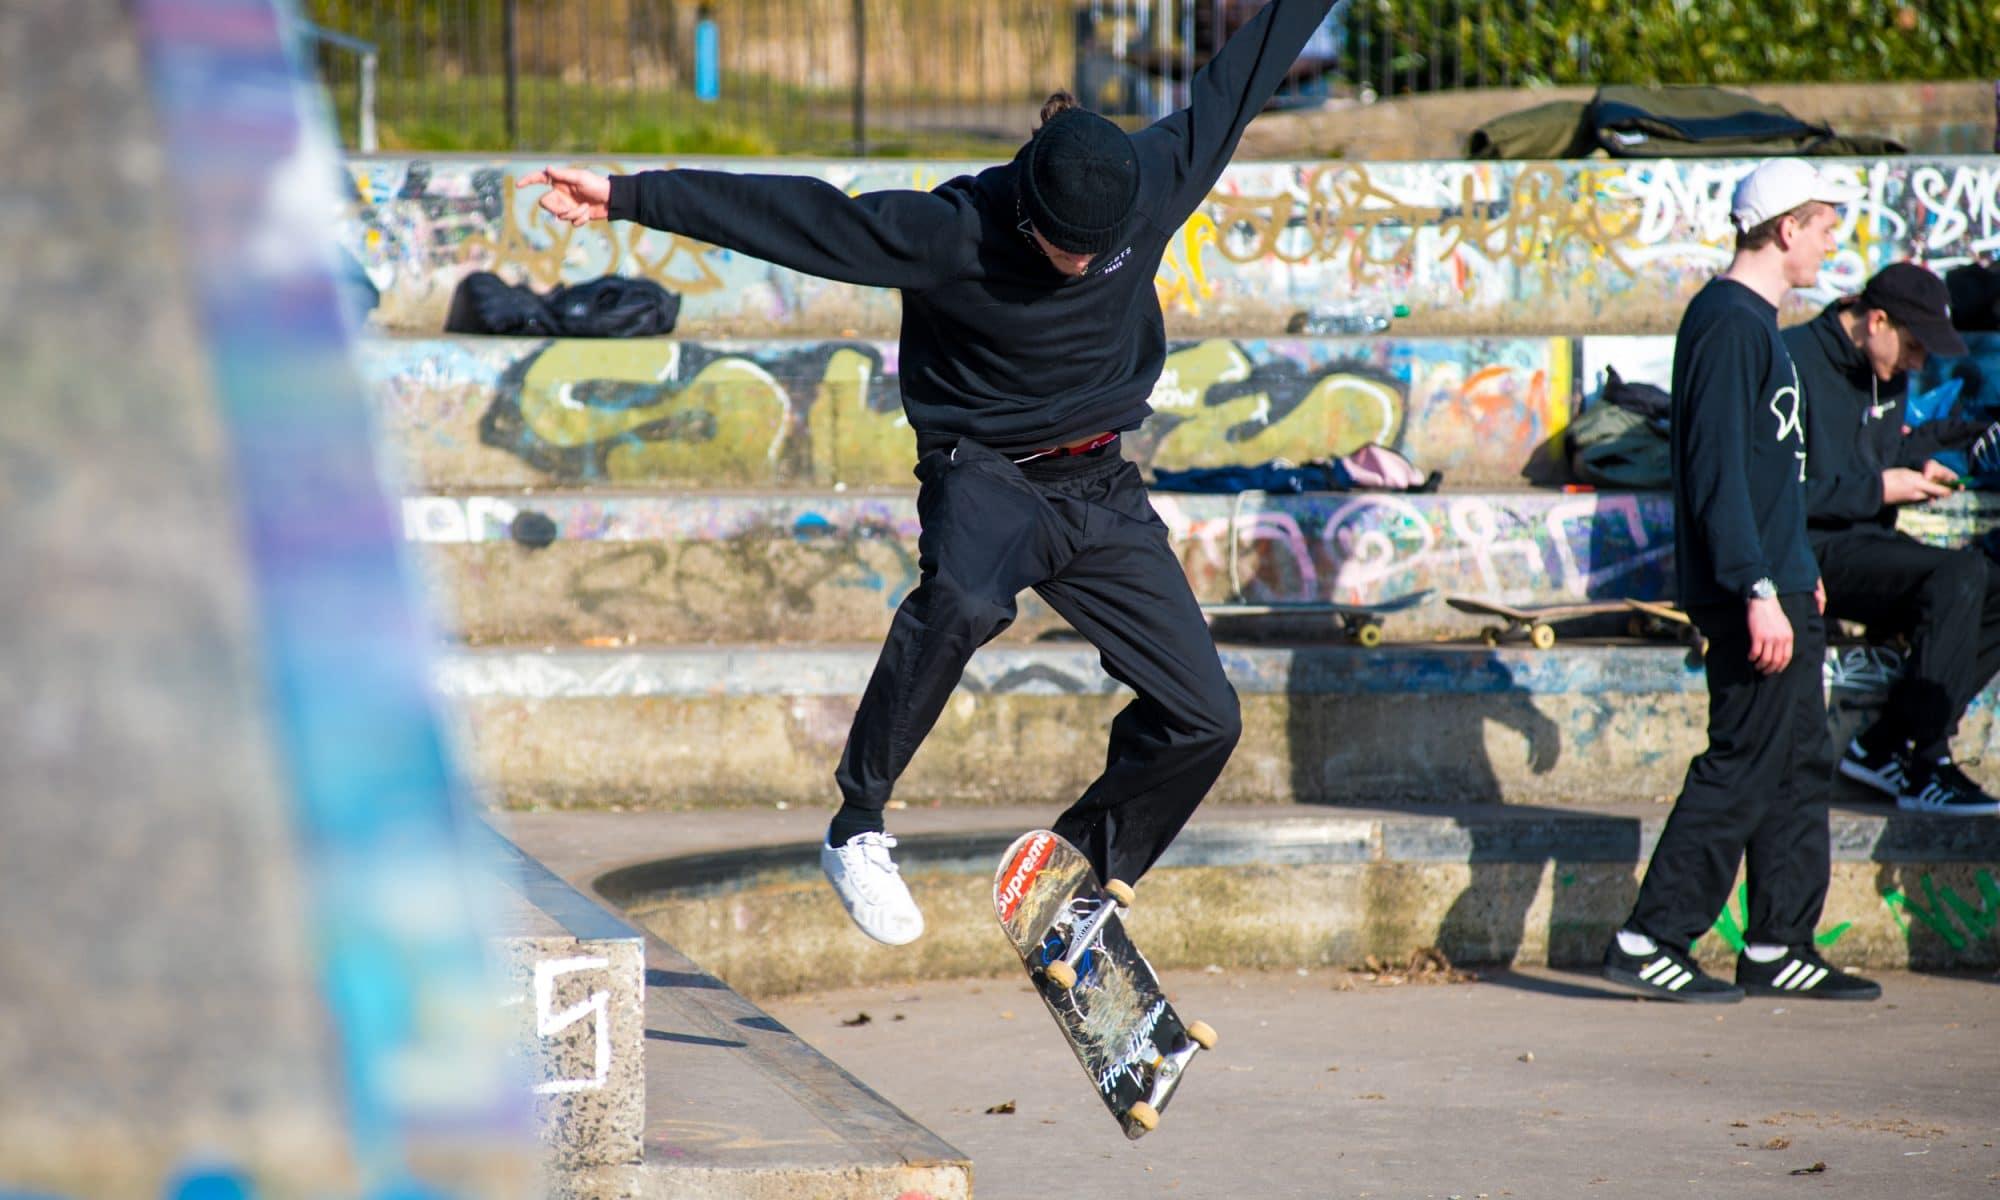 a-trip-to-the-skatepark-sir-edwards-roadtrip